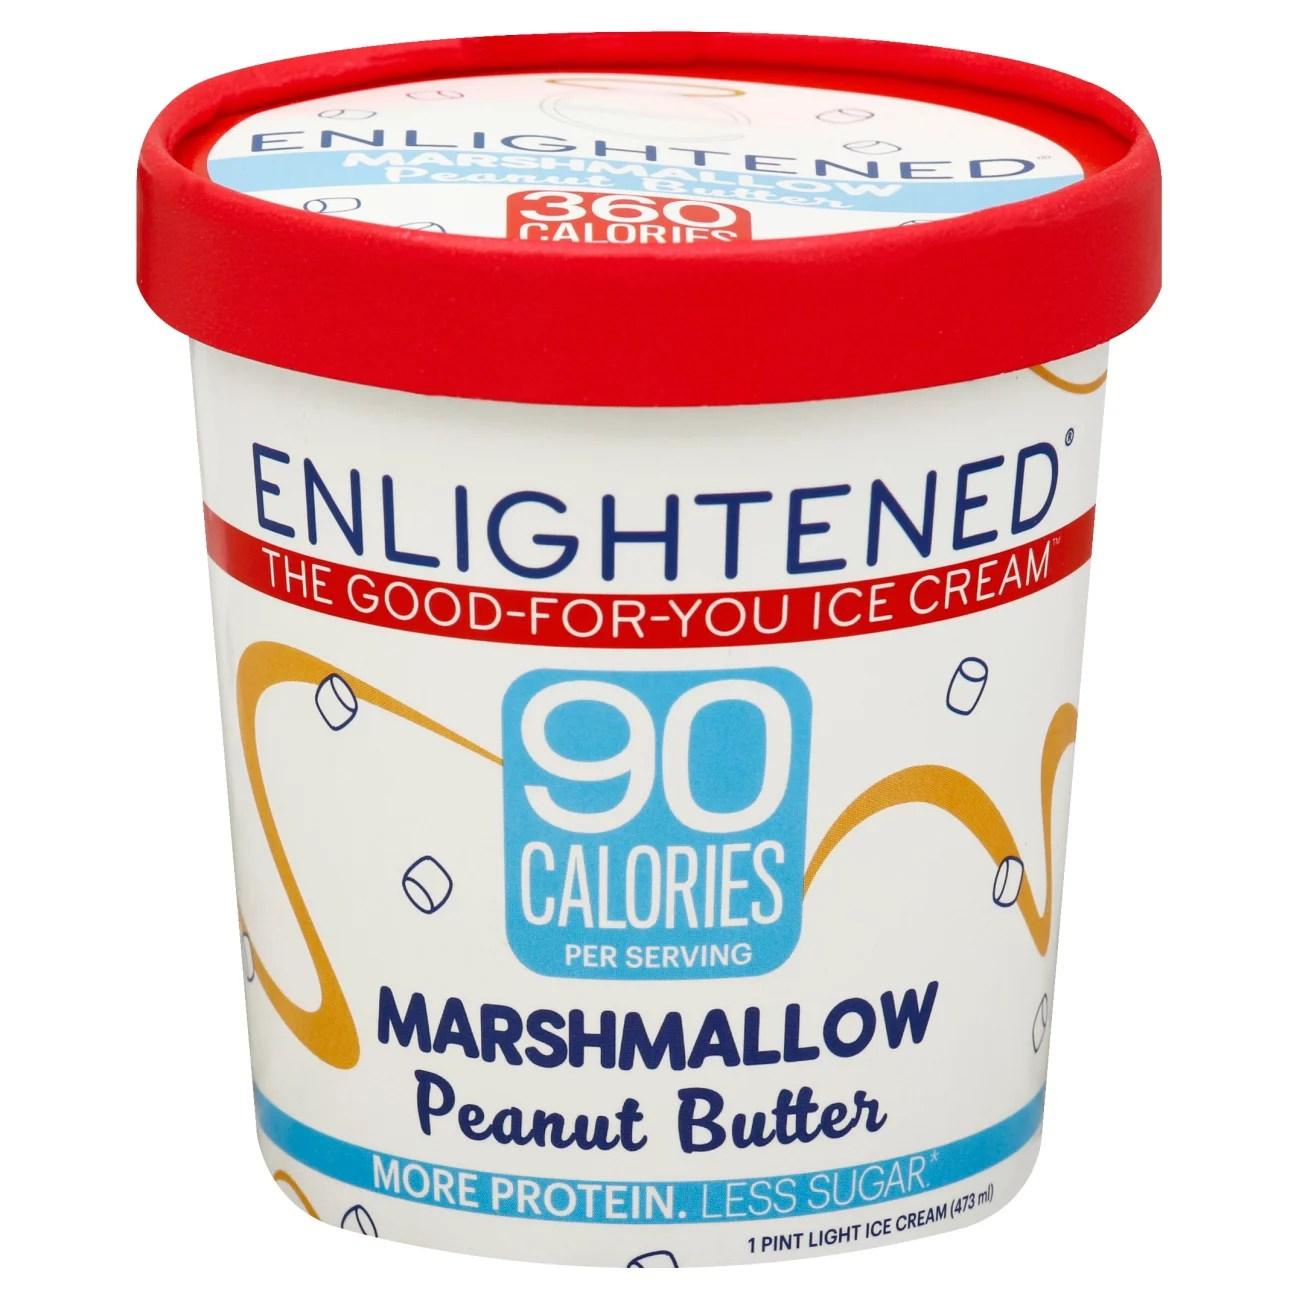 Enlightened Marshmallow Peanut Butter Ice Cream - Shop Ice ...